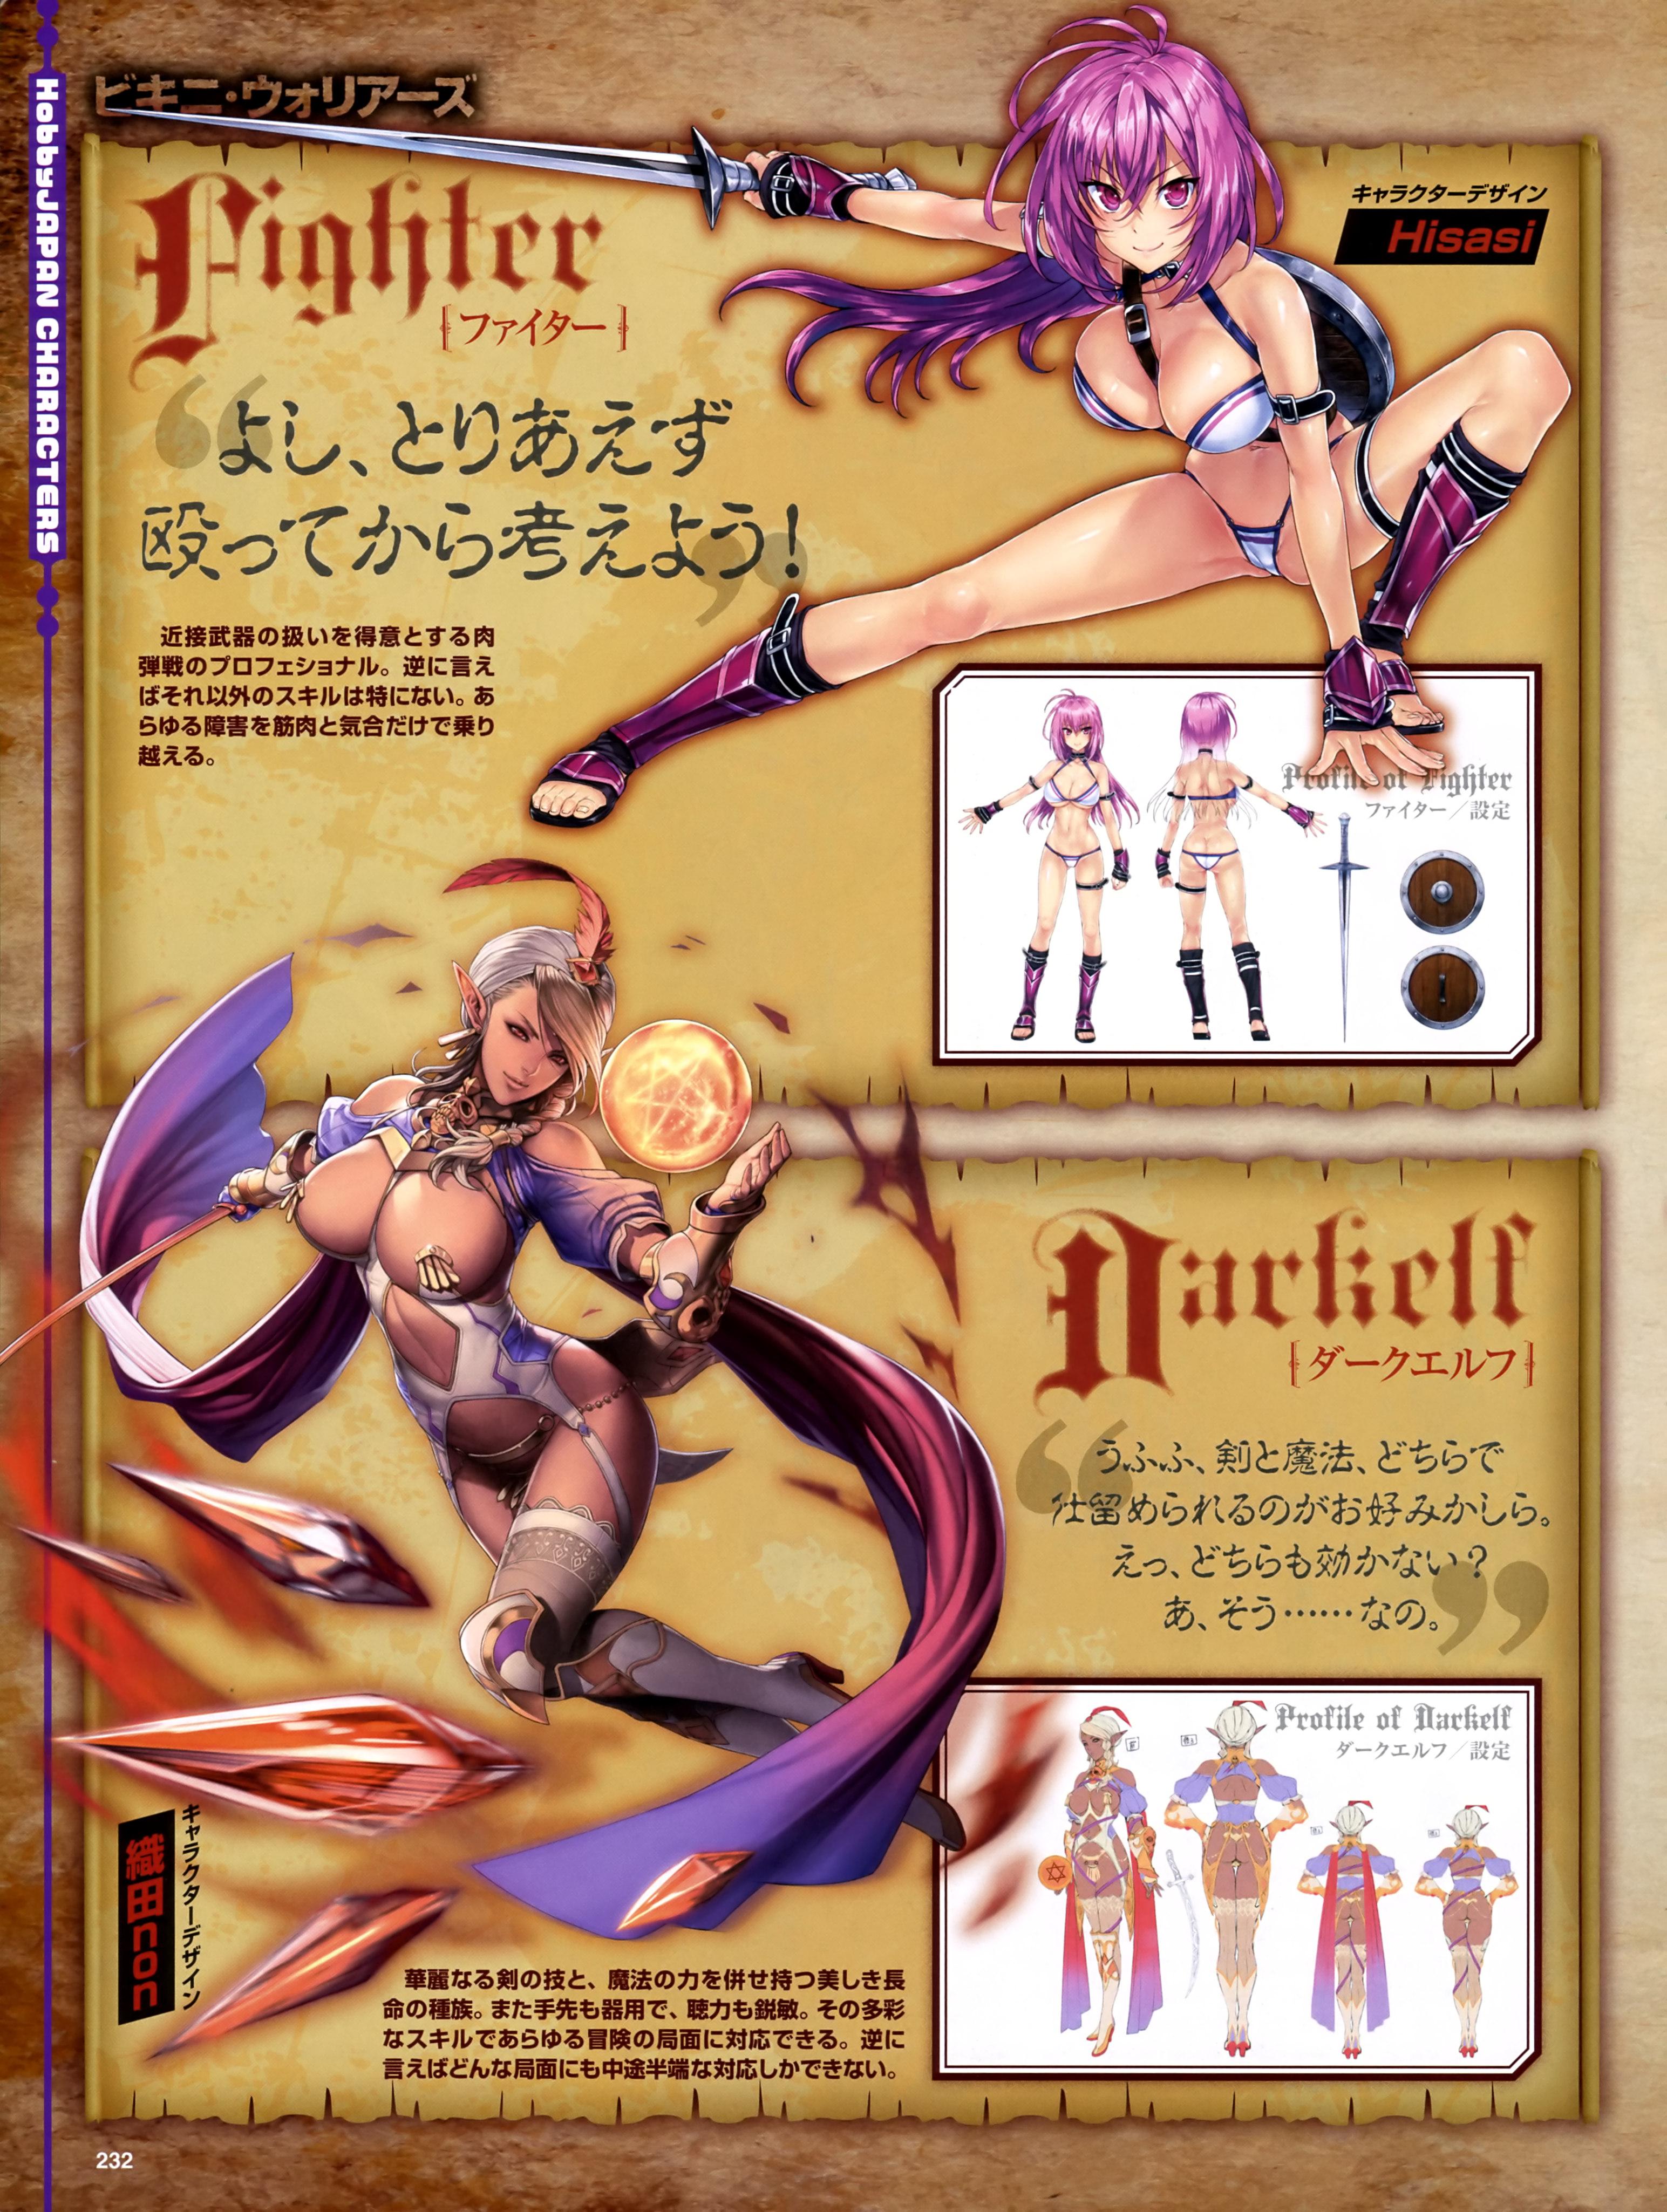 Bikini Warriors Anime Character Designs Have Major Plot 1